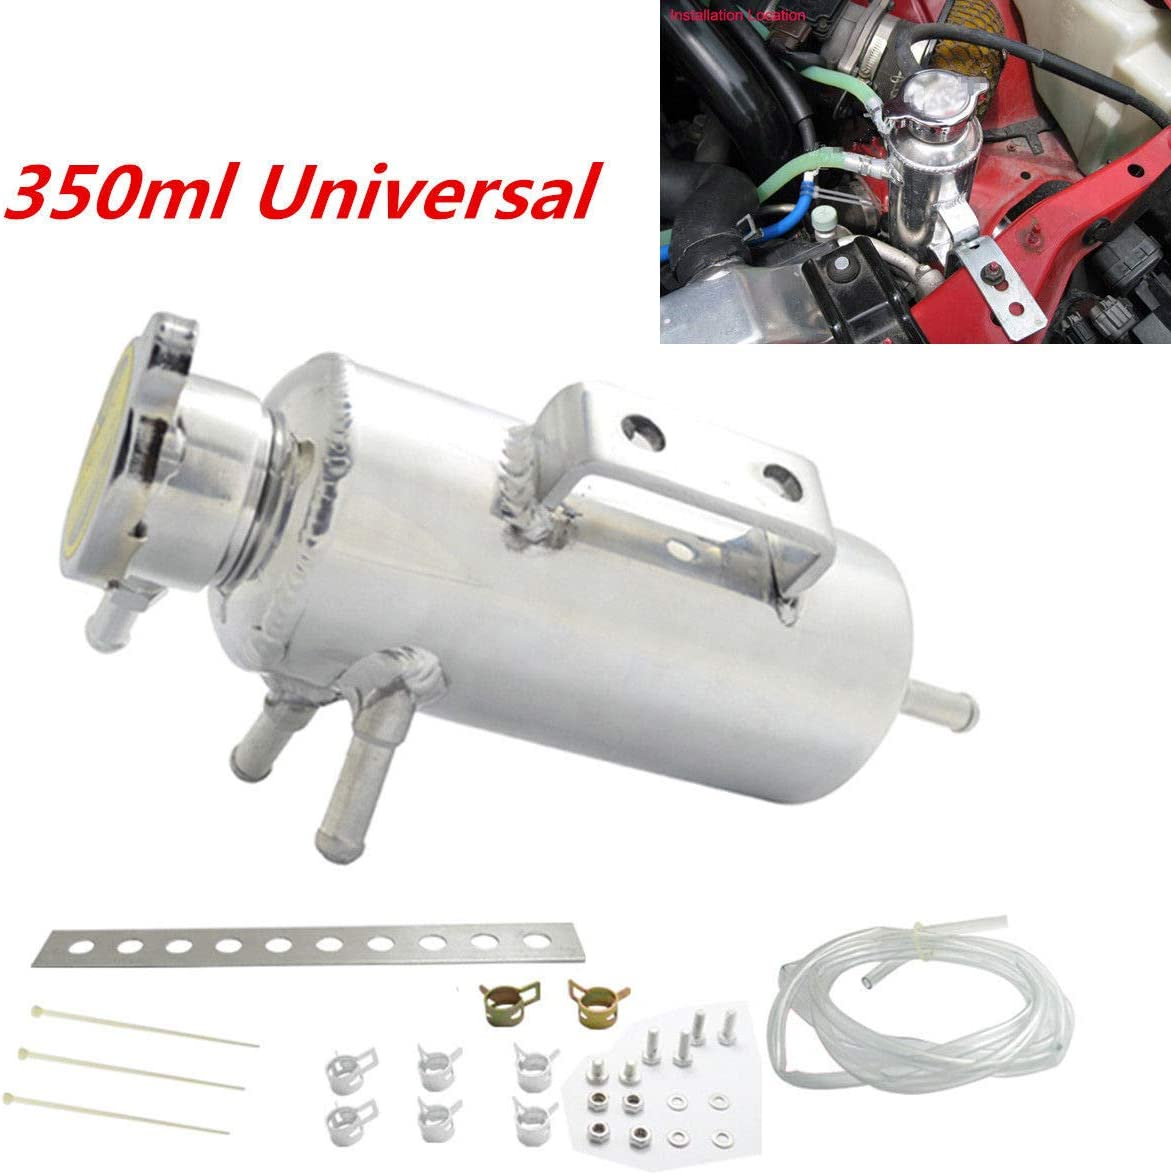 800ml Overflow Catch Tank Radiator Coolant Expansion Tank Bottle Header Aluminum